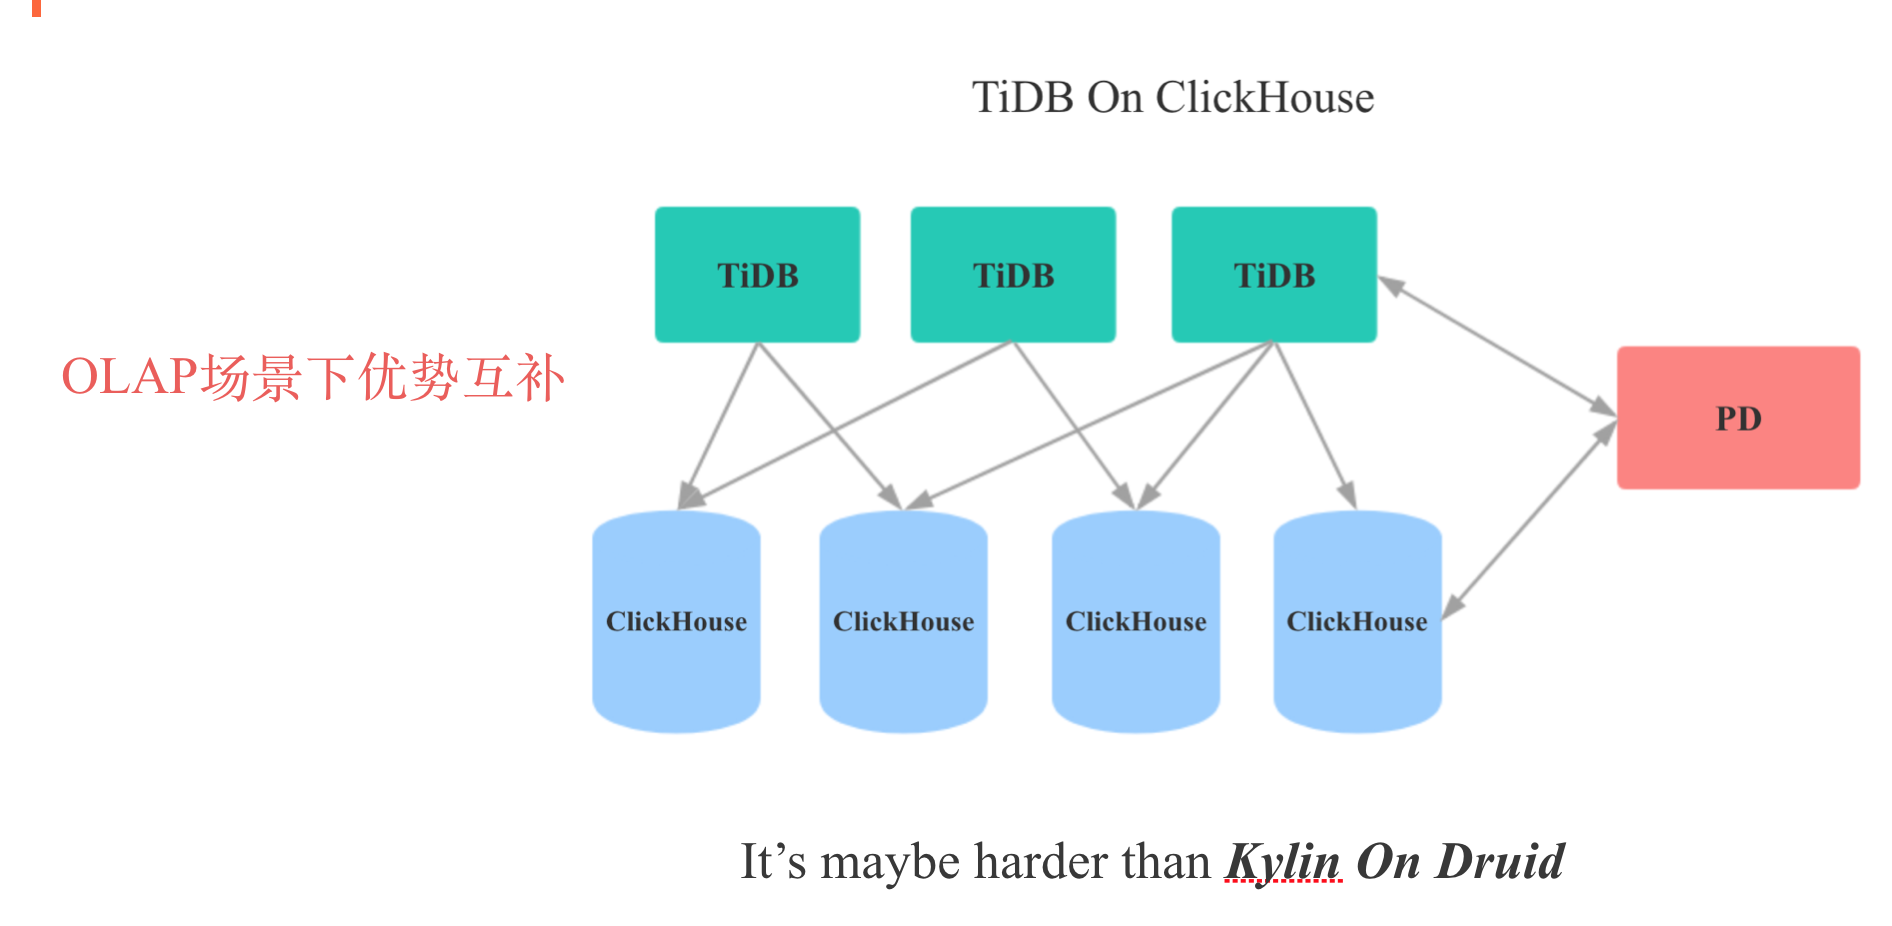 TiDB On ClickHouse